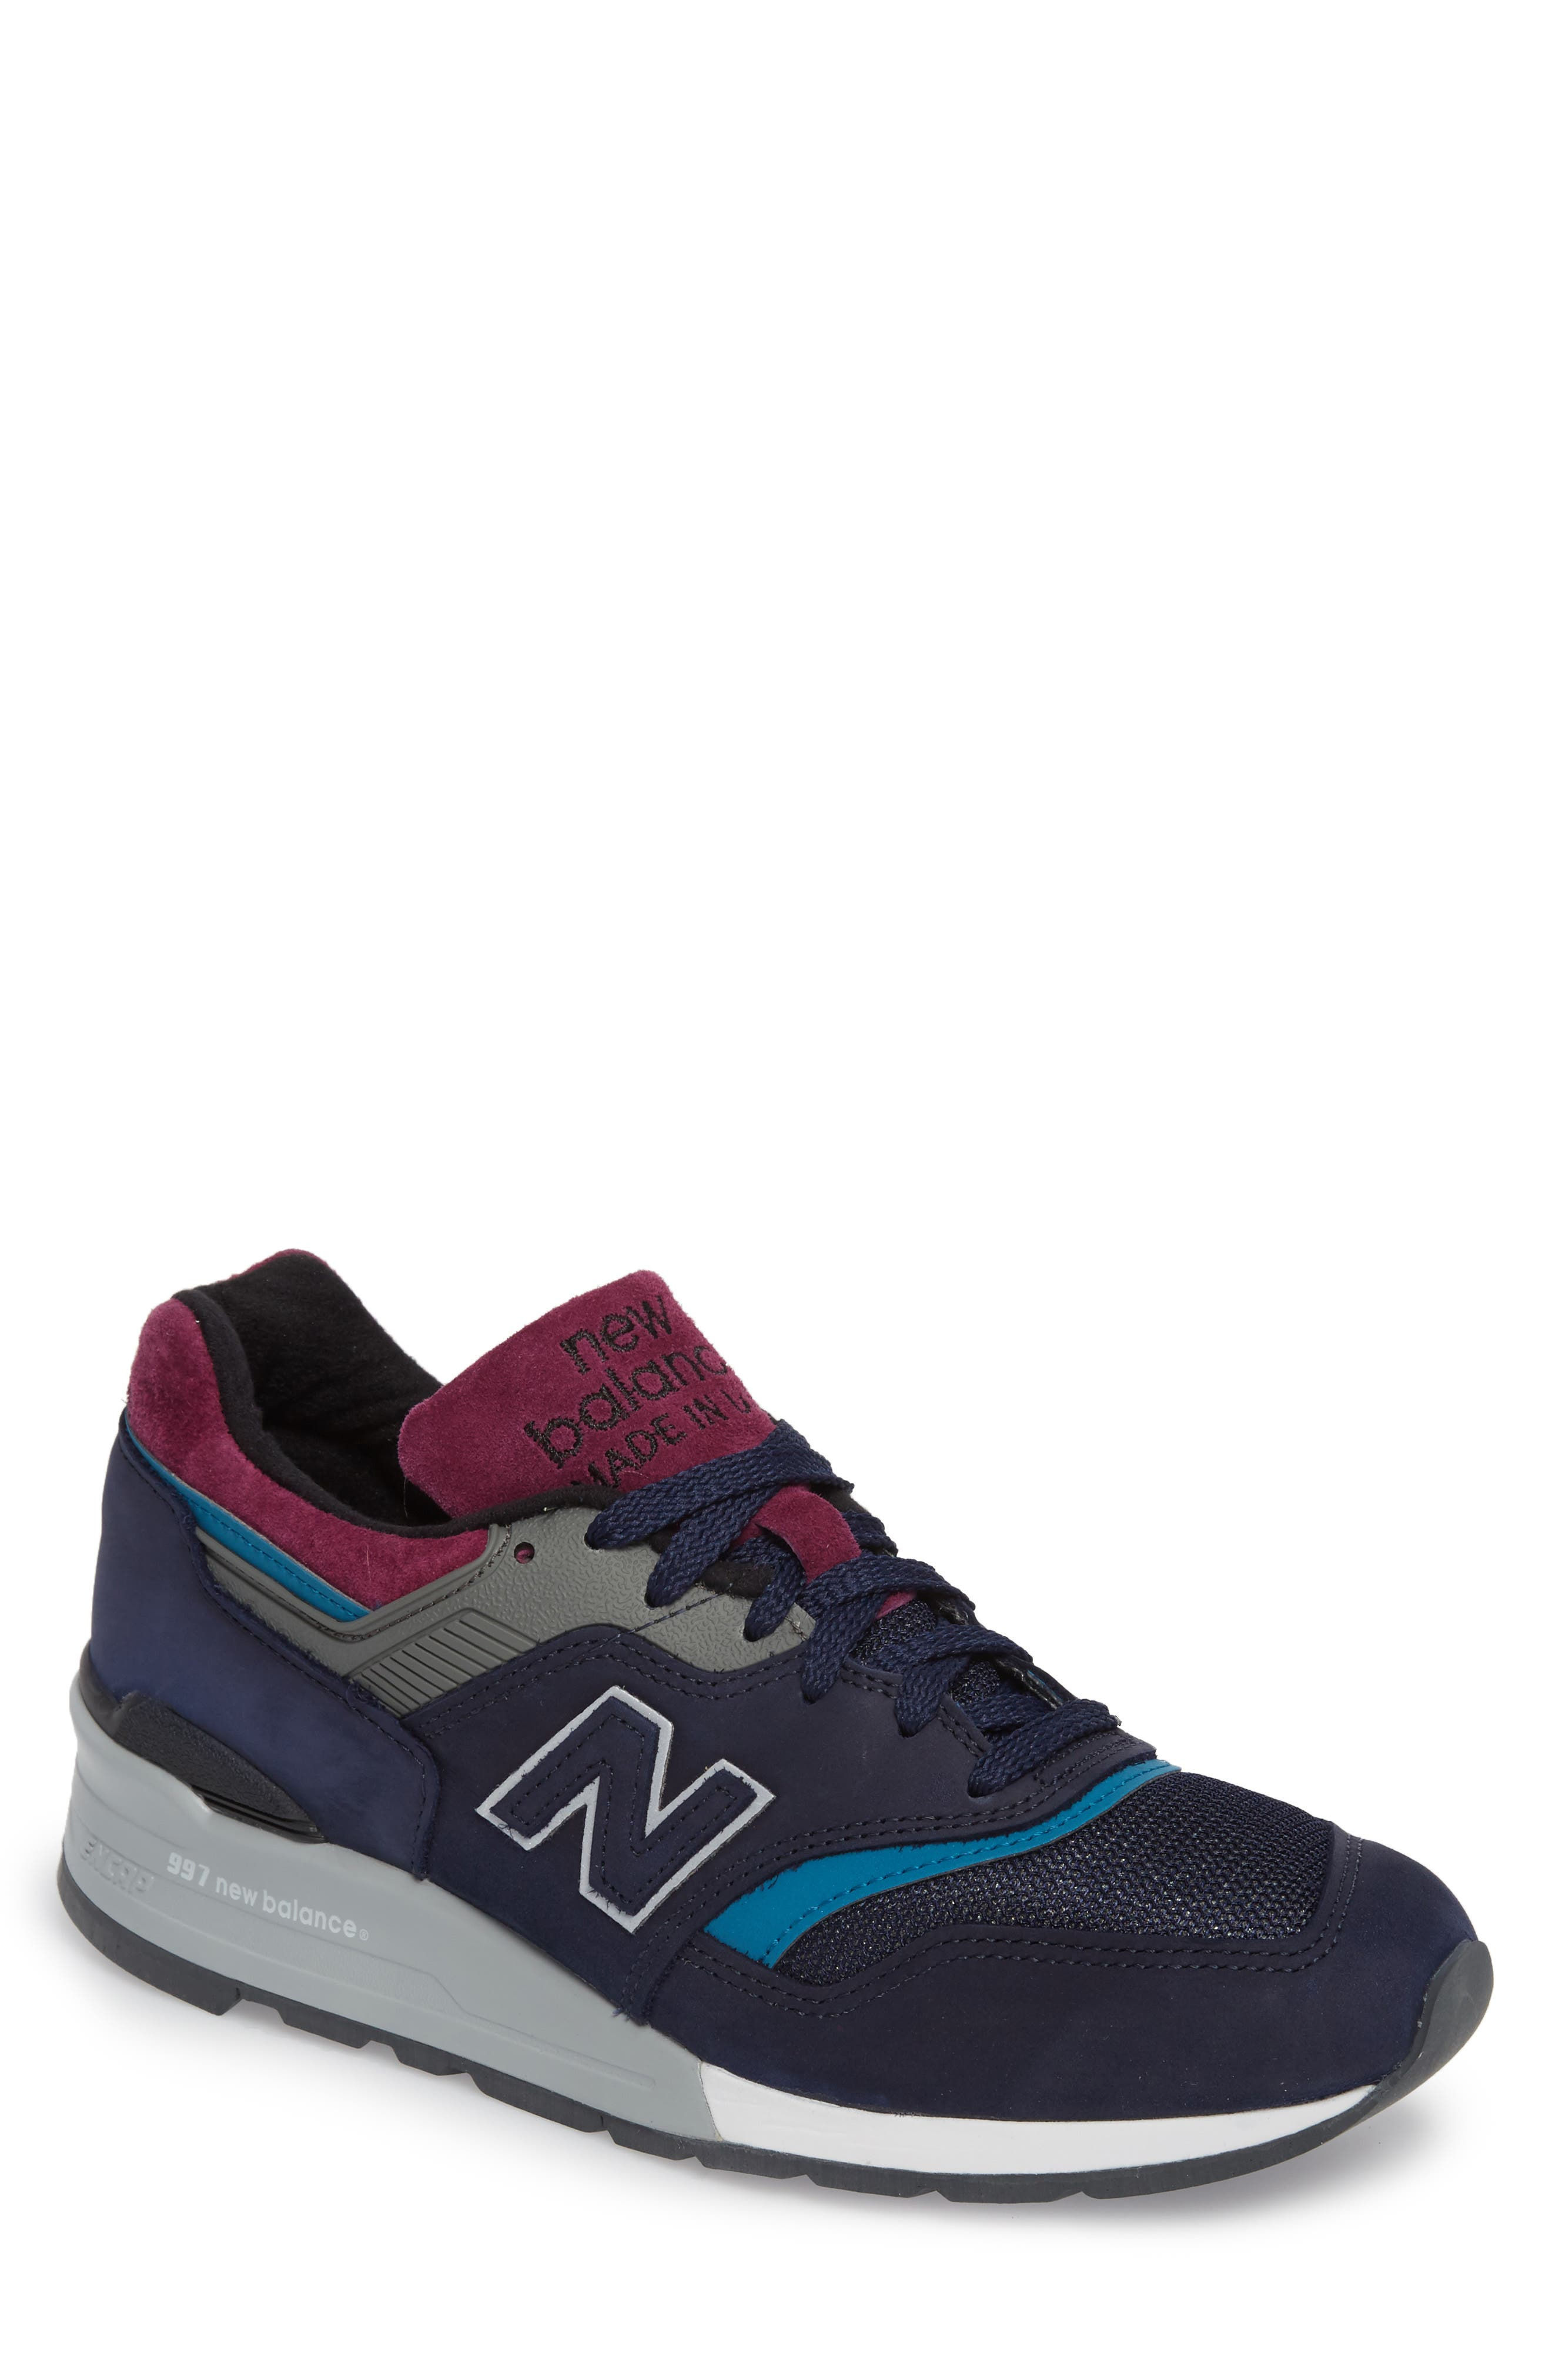 997 Sneaker,                             Main thumbnail 1, color,